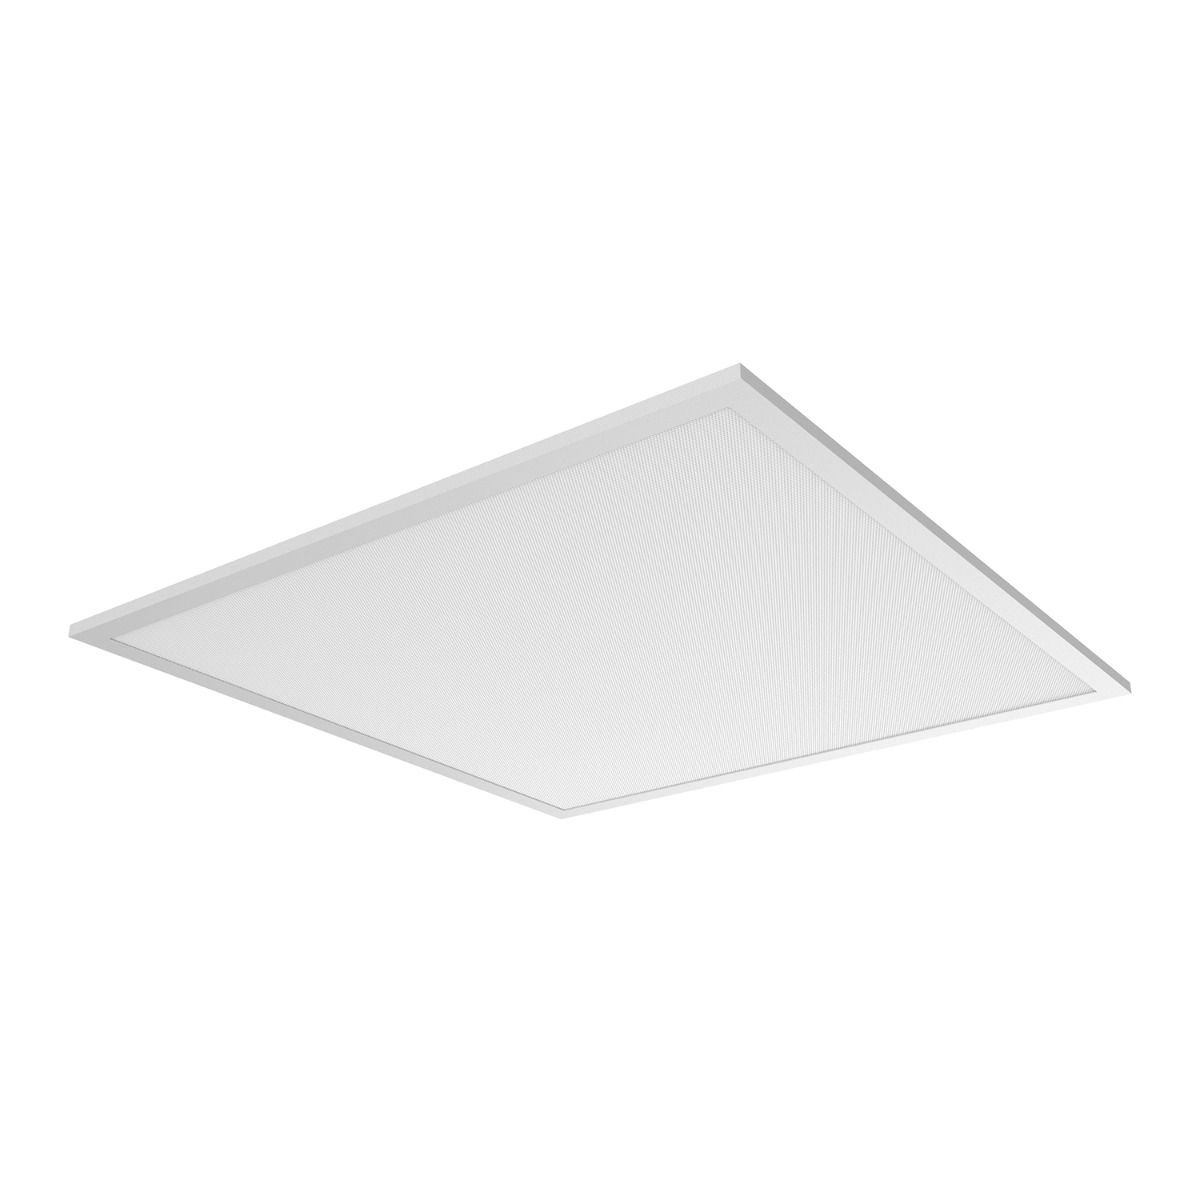 Noxion LED Panel Delta Pro V3 DALI 30W 4000K 4070lm 60x60cm UGR <22 | Kaltweiß - Ersatz für 4x18W